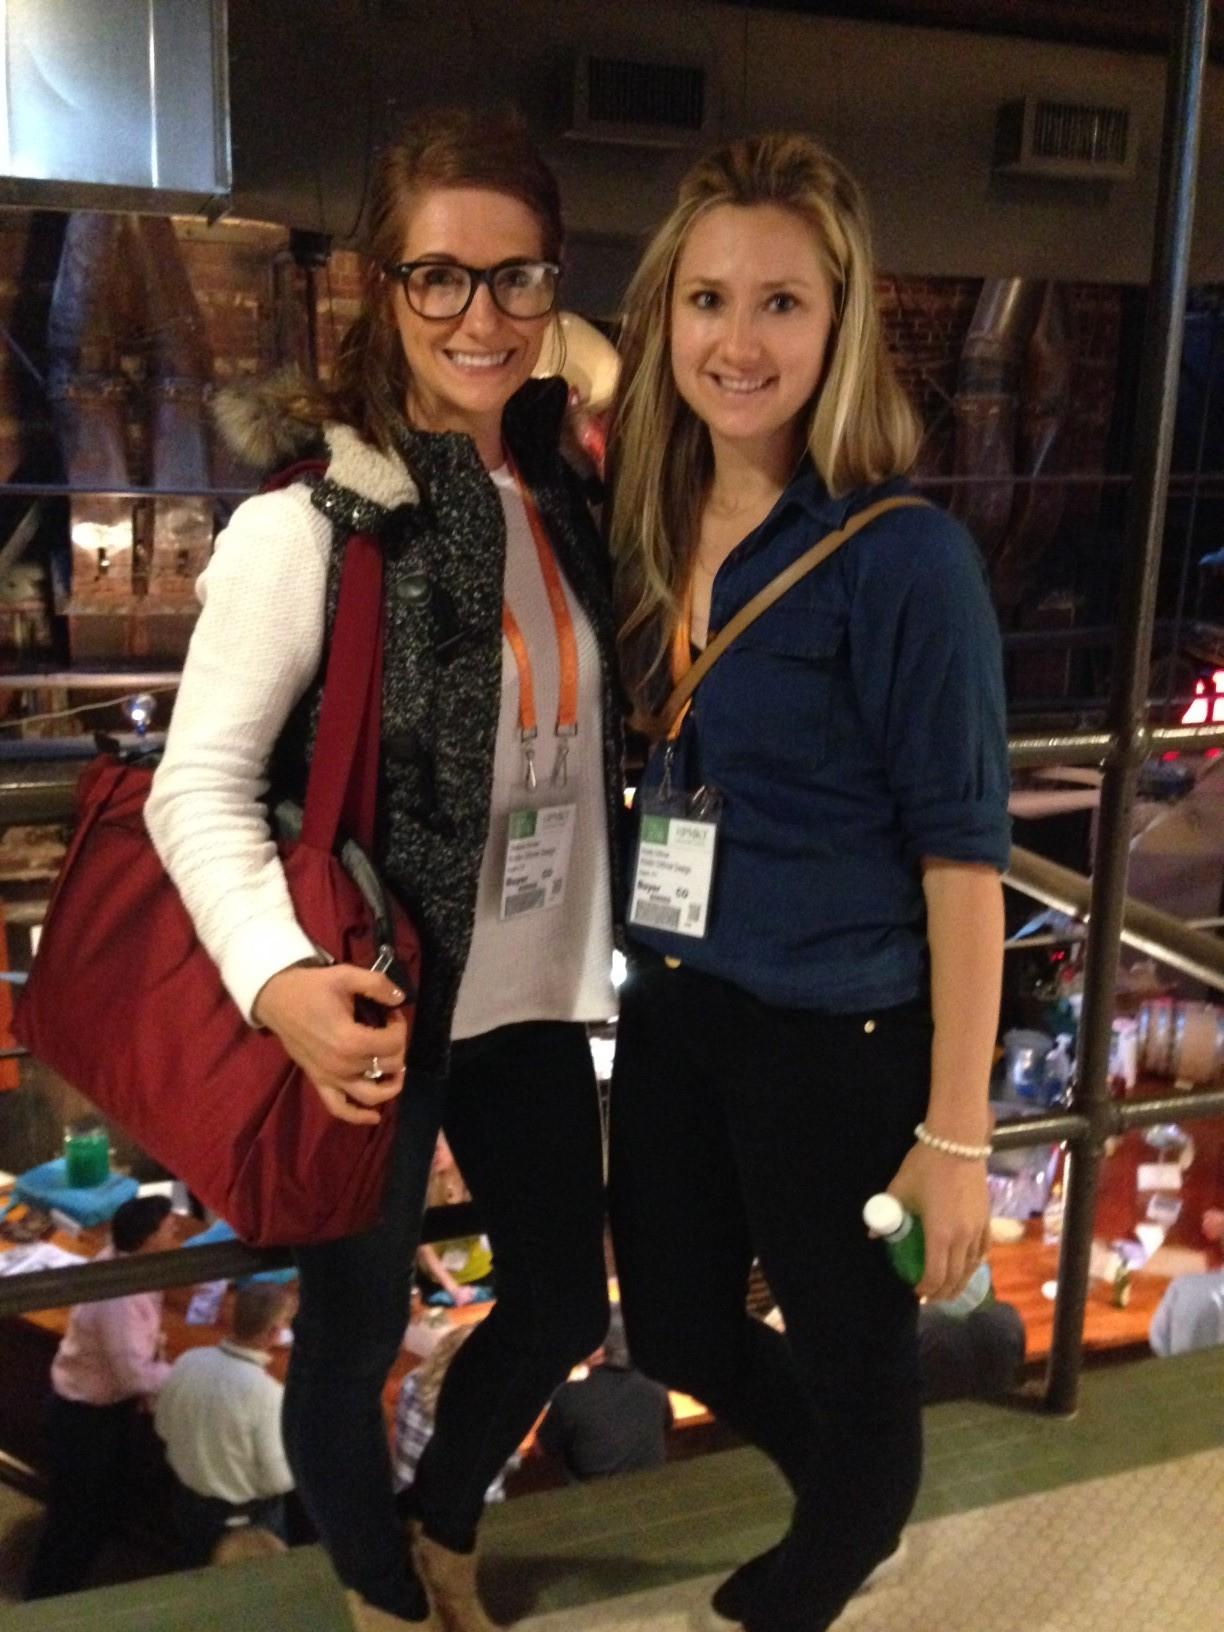 Stefanie and Kristin at High Point.